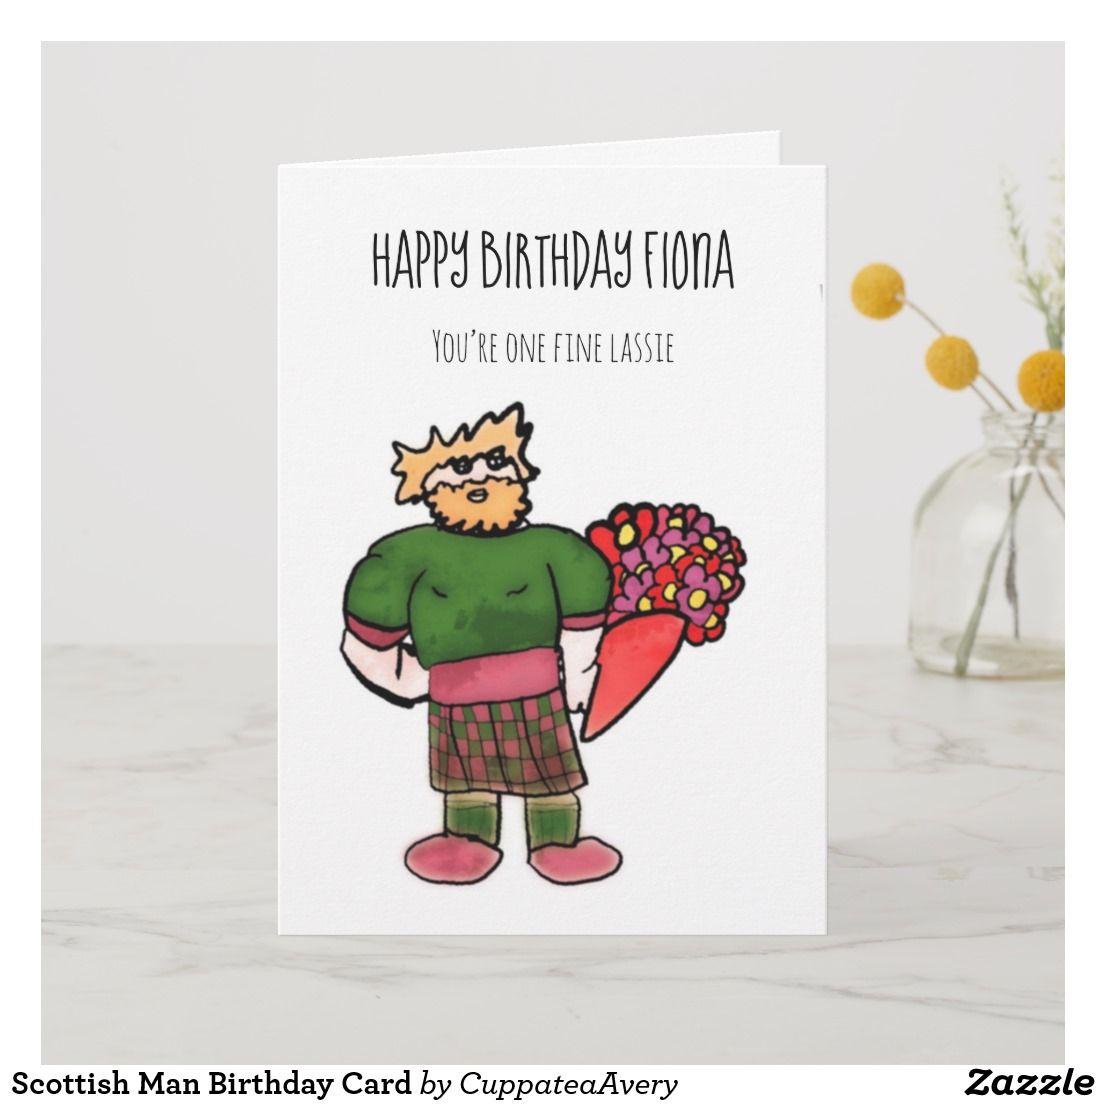 Scottish Man Birthday Card Zazzle Com Au Birthday Cards For Men Birthday Cards Man Birthday